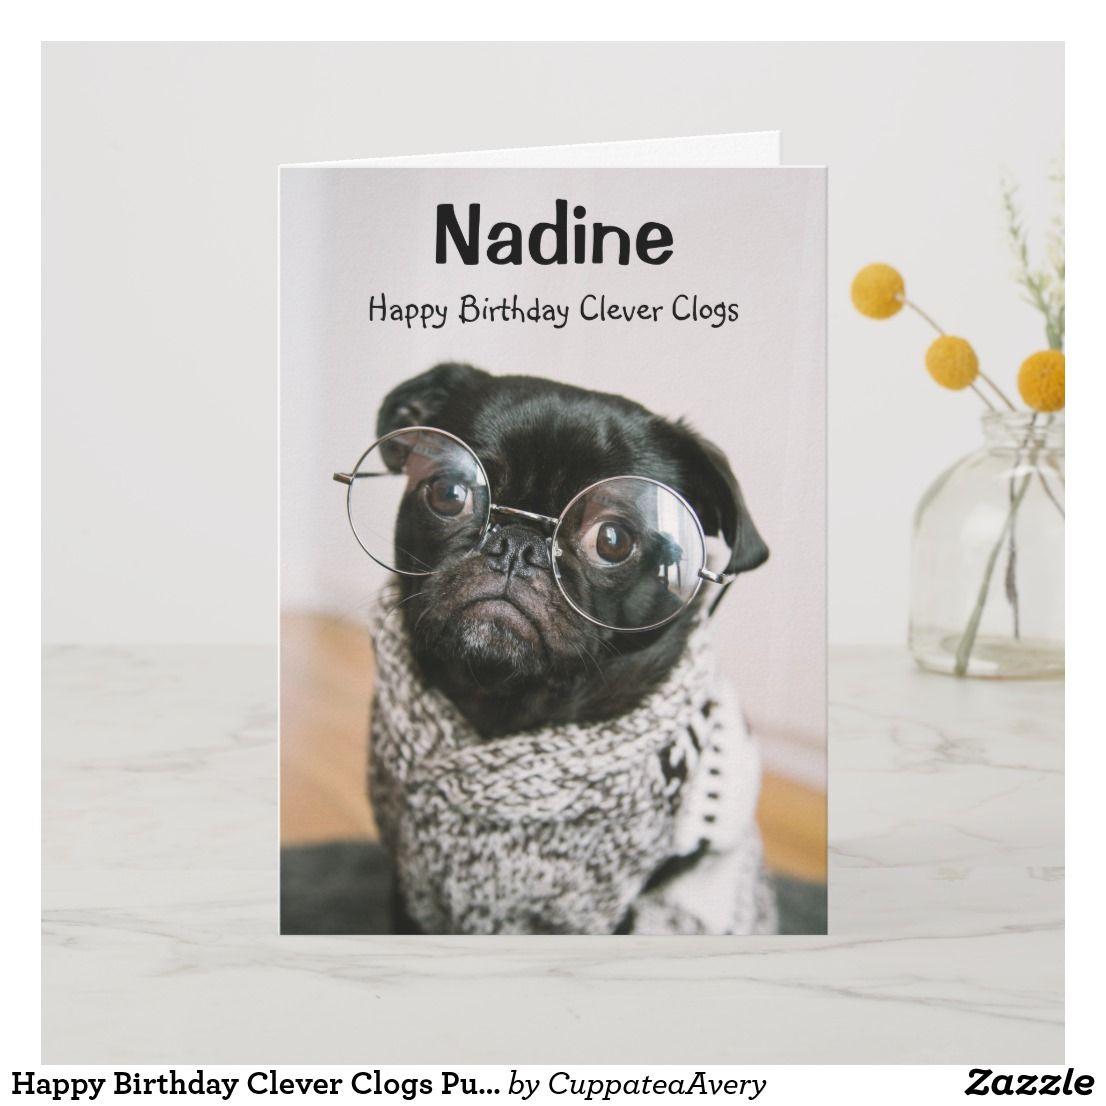 Happy Birthday Clever Clogs Pug Dog Card Zazzle Com Au Dog Birthday Card Pug Dog Dog Birthday